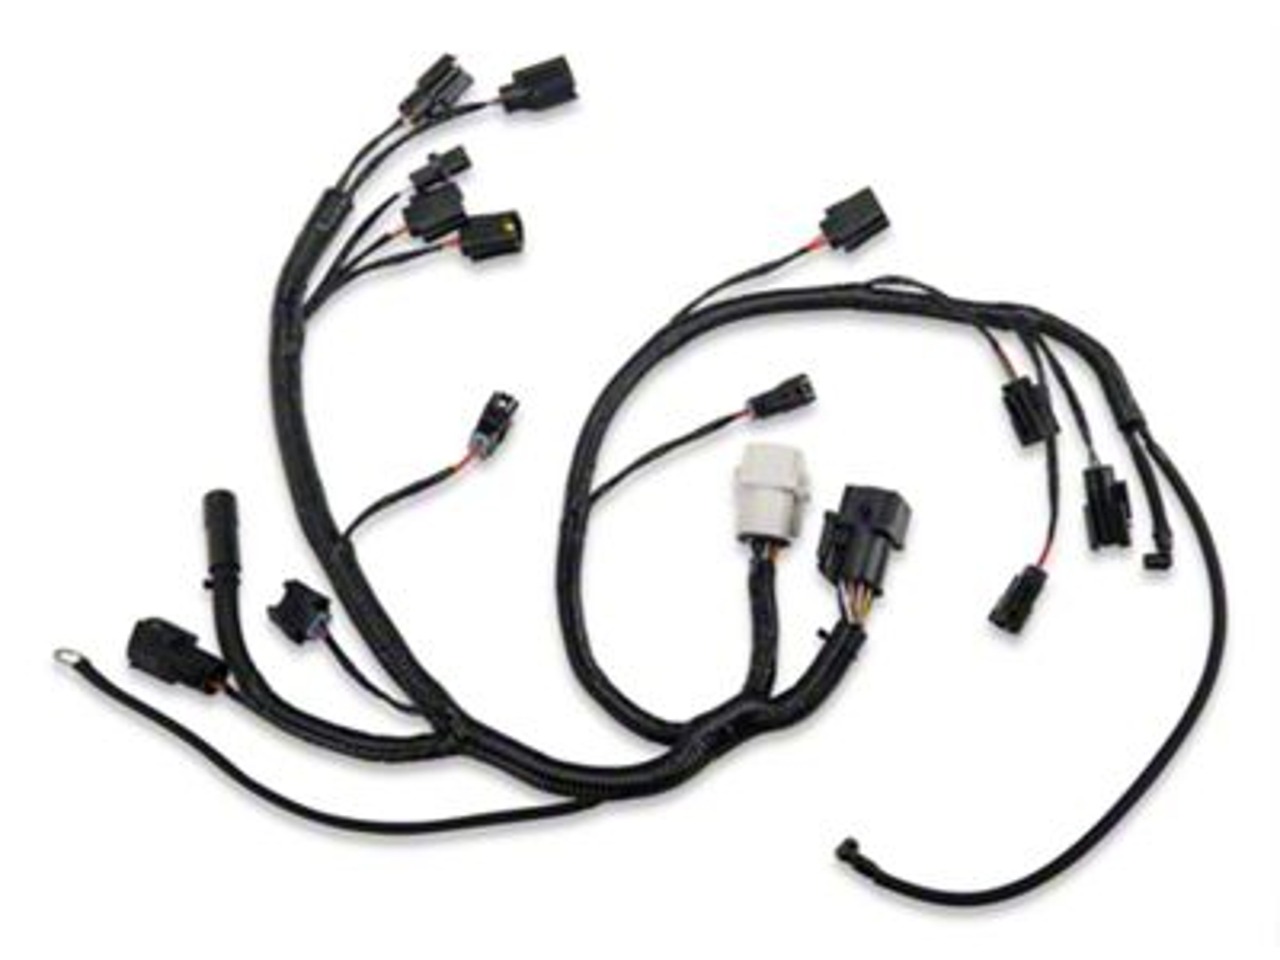 fuel injector wiring wiring diagram viddyup 7 Pole Trailer Wiring opr mustang fuel injector wiring harness 100628 87 93 5 for fuel injector wiring